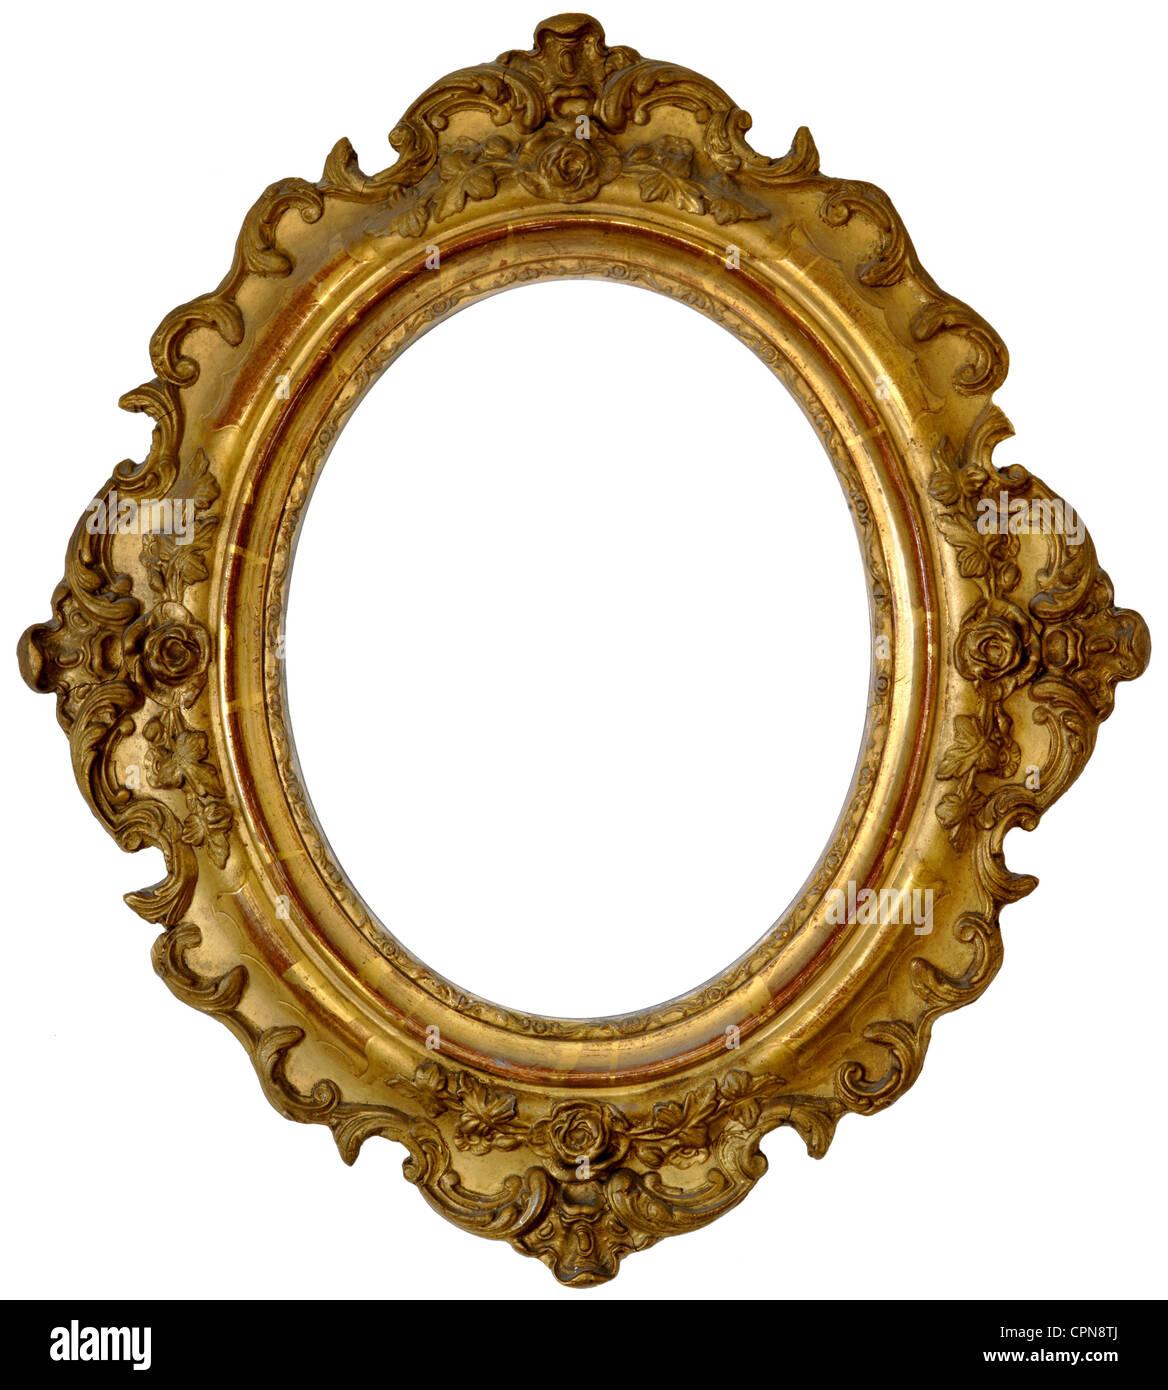 fine arts, picture frame, golden picture frame, oval, wooden frame ...